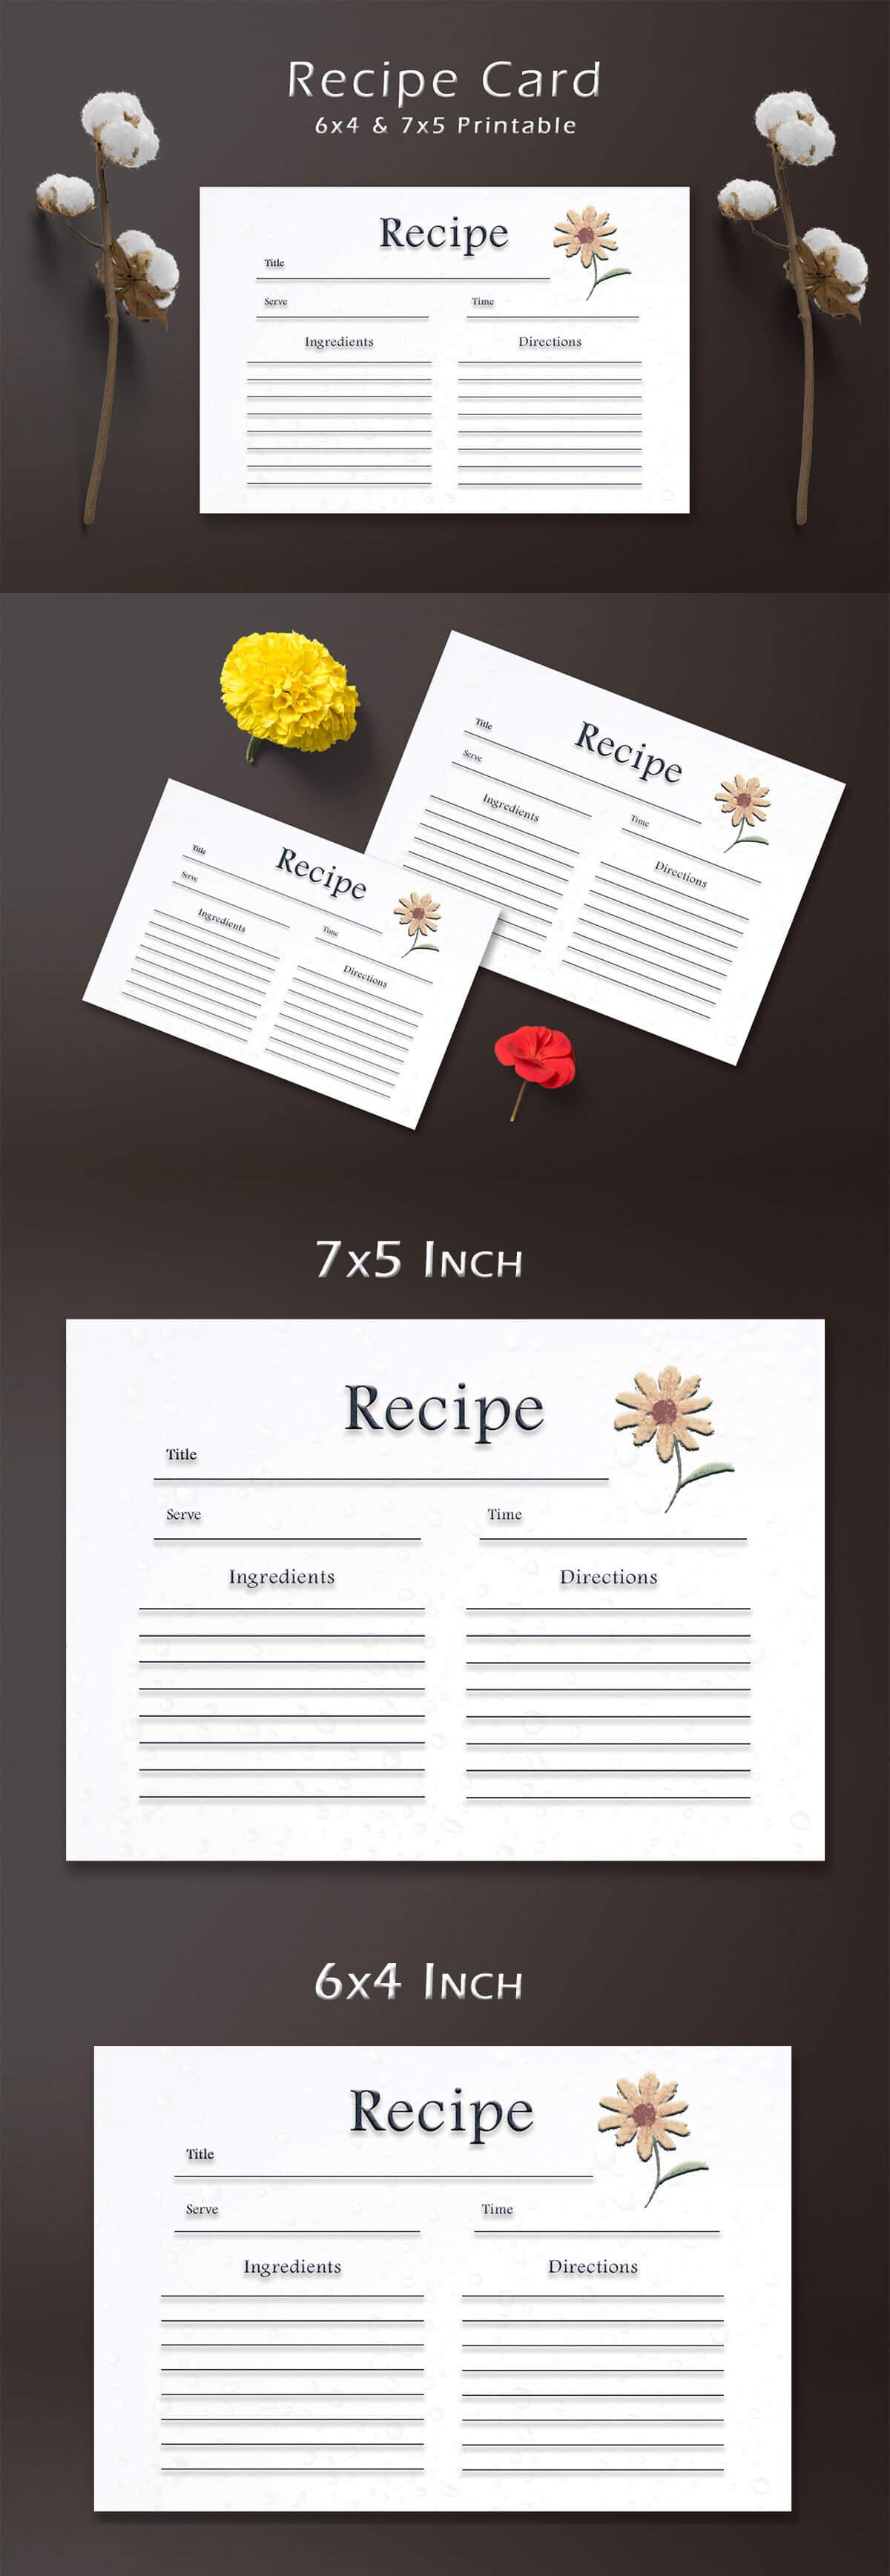 Free Sunflower Recipe Card Template